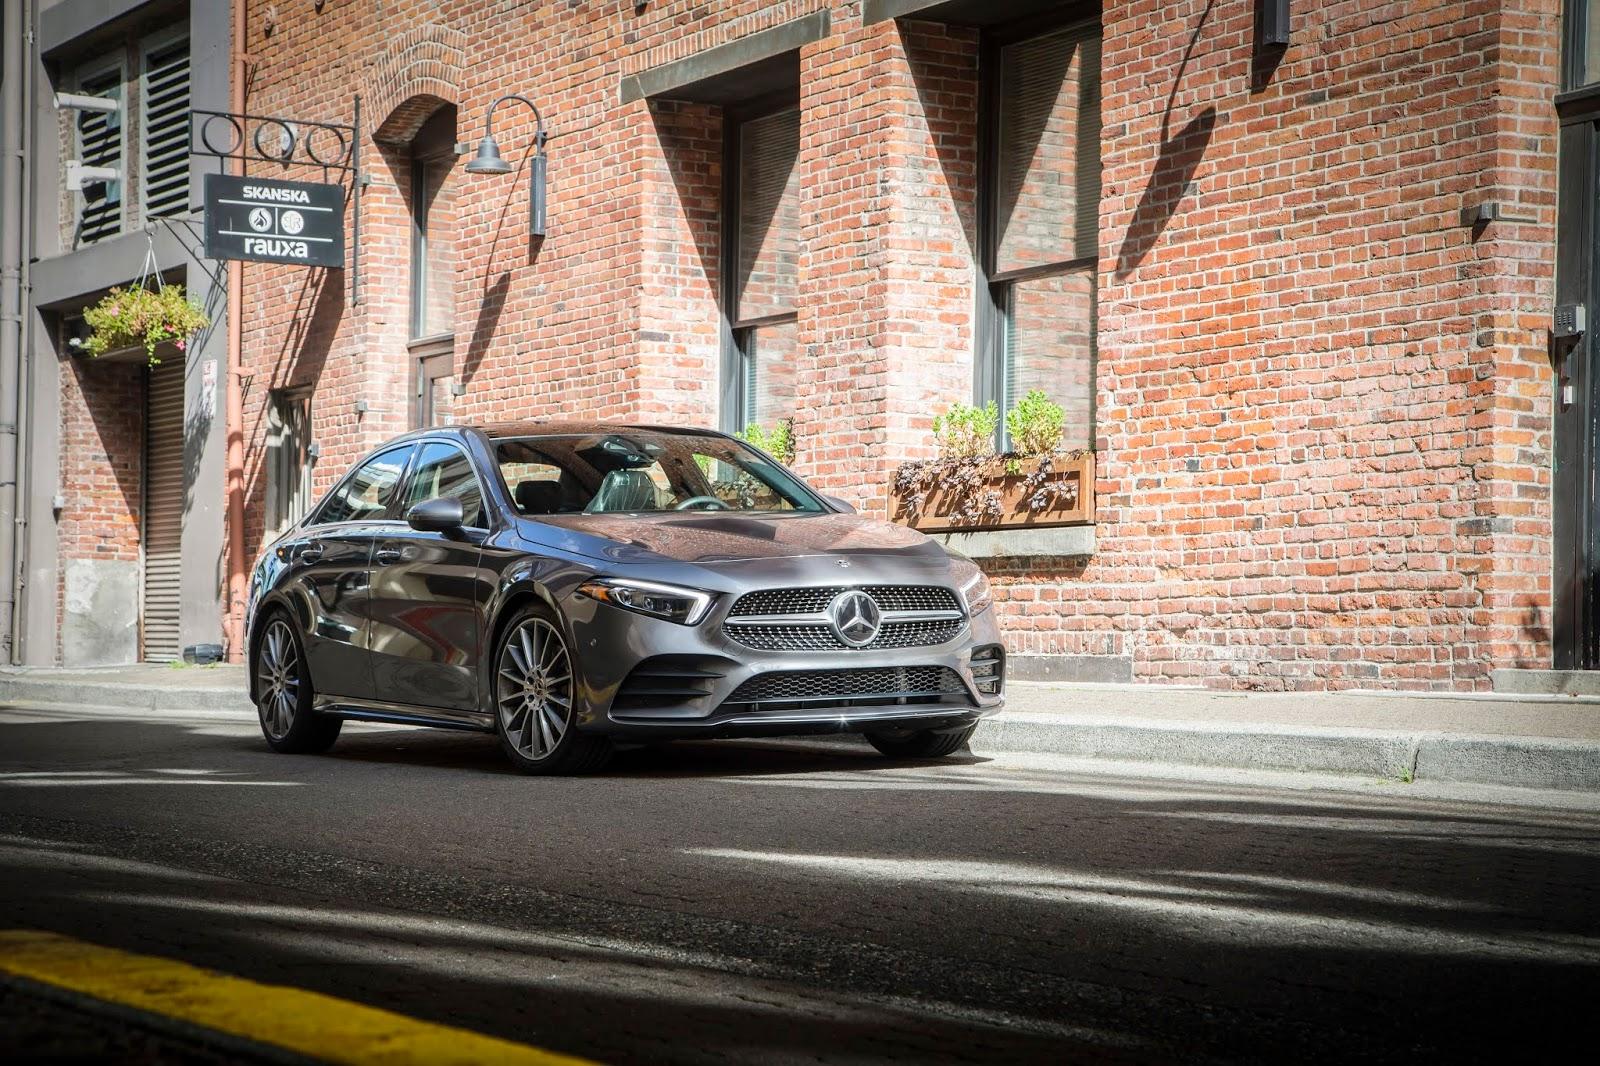 18C0776 001 Από 28.230 ευρώ η τιμή της Mercedes A-Class Sedan Luxury sedan, Mercedes, Mercedes AMG, premium sedan, sedan, zblog, καινούργιο, καινούρια, τιμες